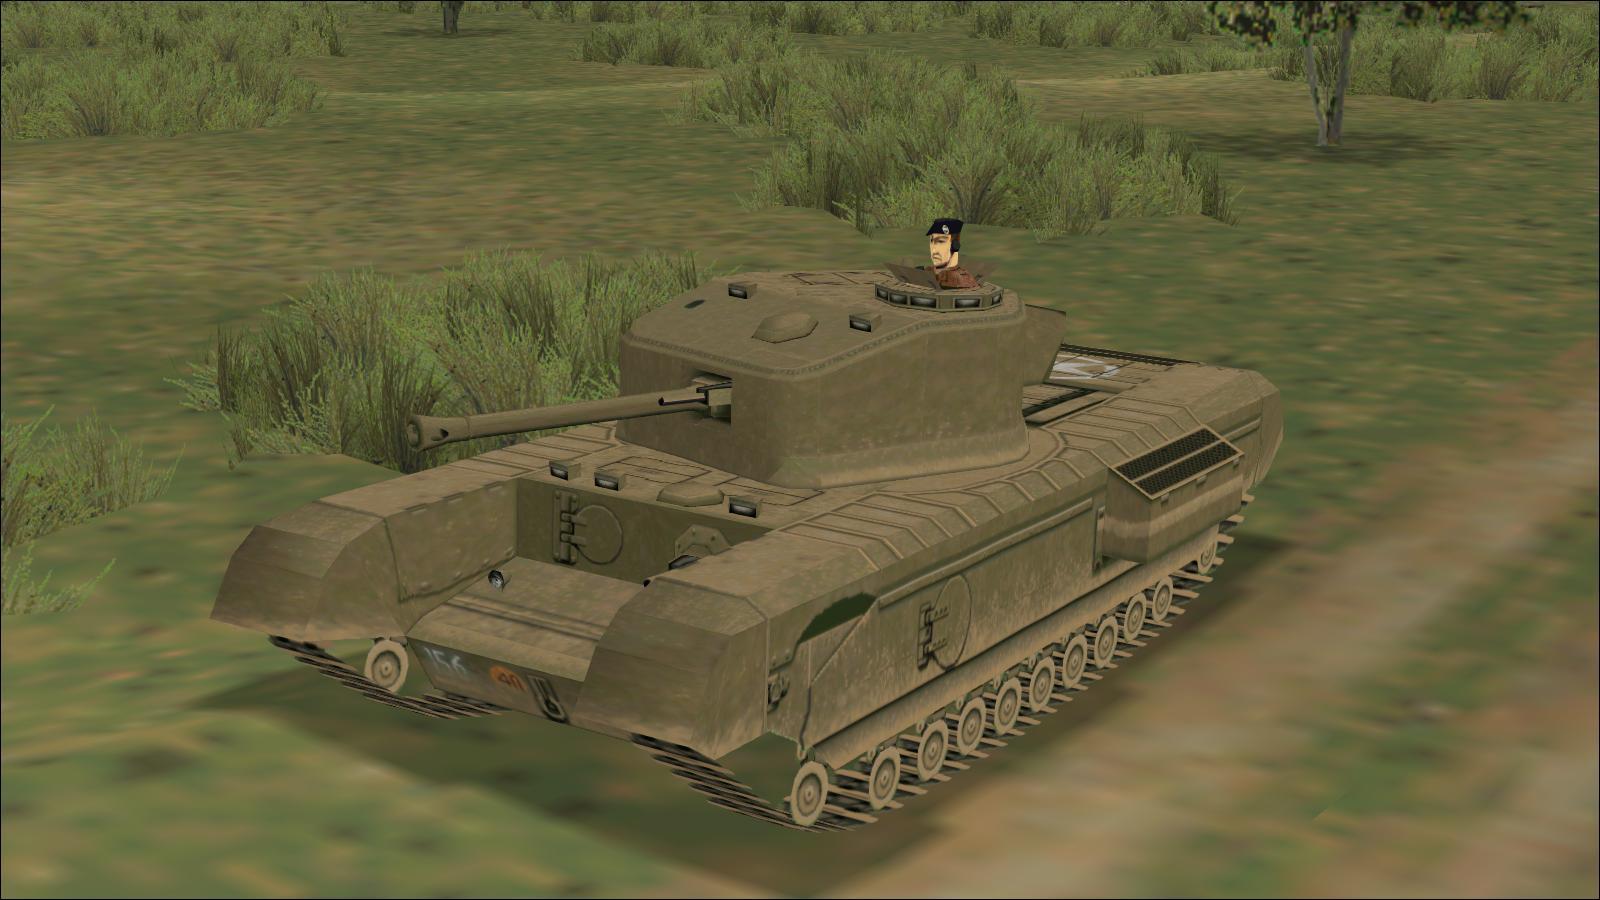 Panzer Elite - Brit44-x beta - South of Hill 112 - Churchill VII, 3 Troop leader's tank